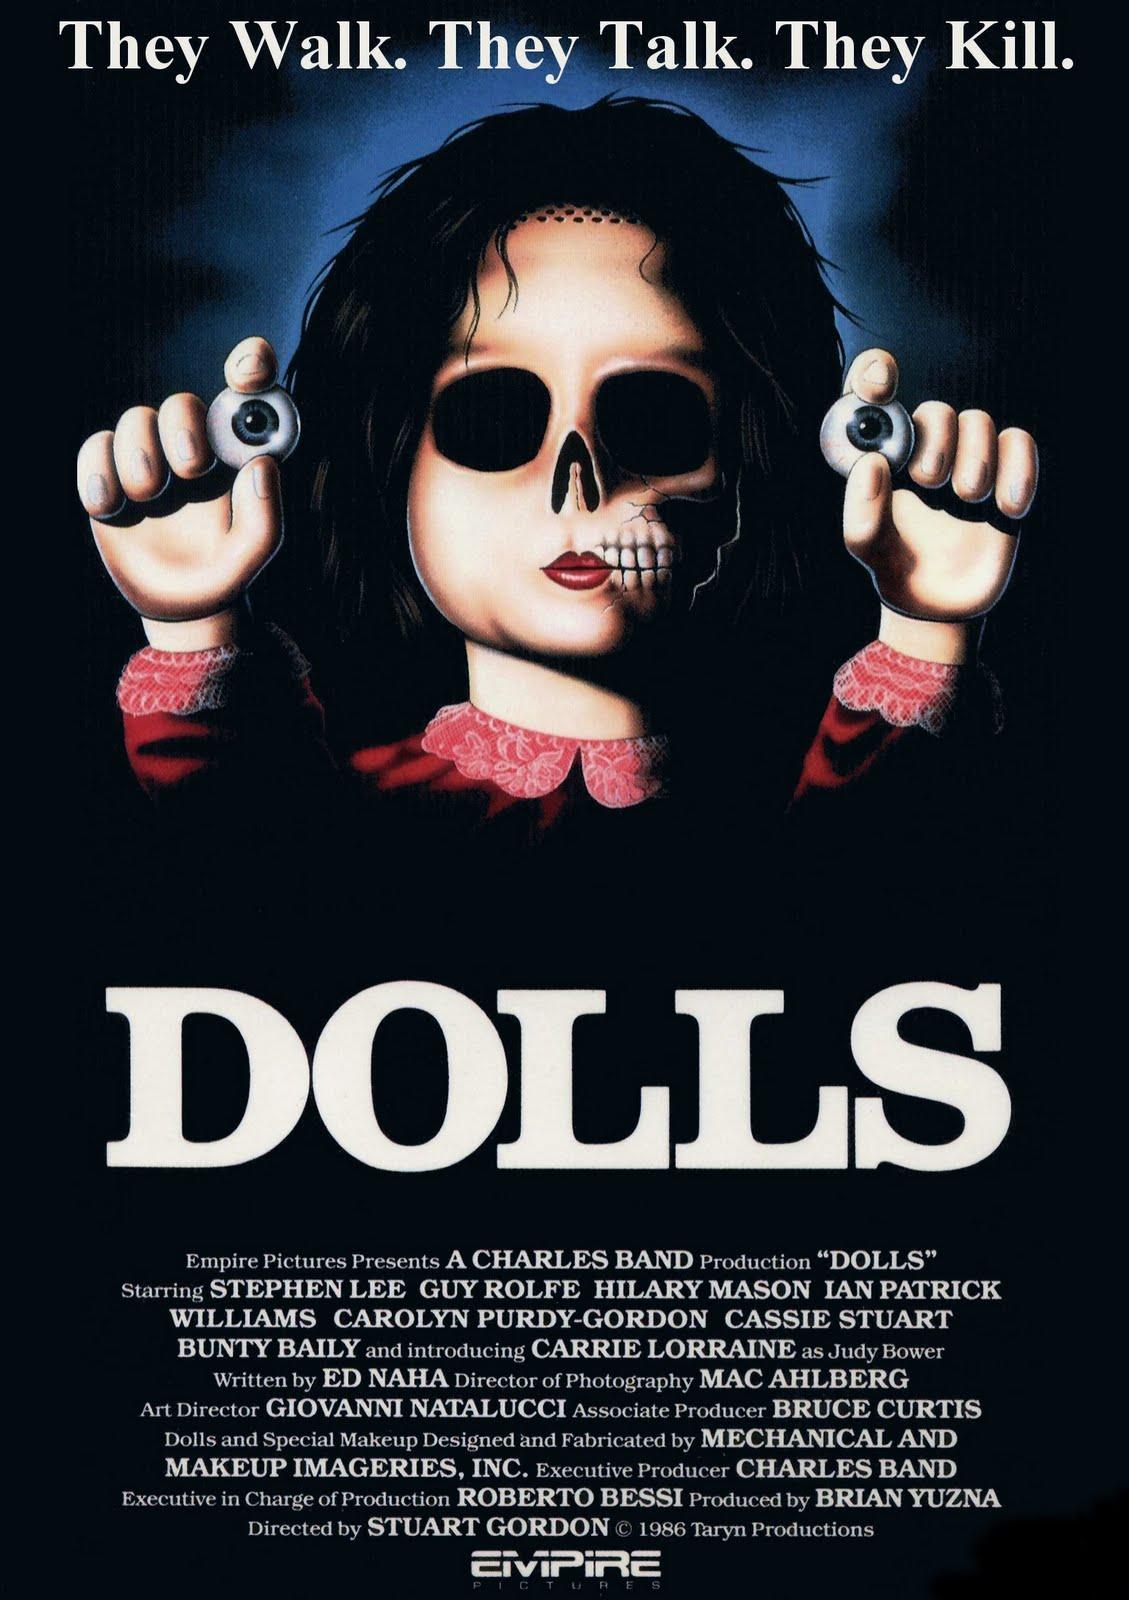 http://1.bp.blogspot.com/-fhmXfnXK_aA/Topn-UbqJJI/AAAAAAAAAP0/i2c-aQTDU-E/s1600/Dolls+-+Poster.jpg